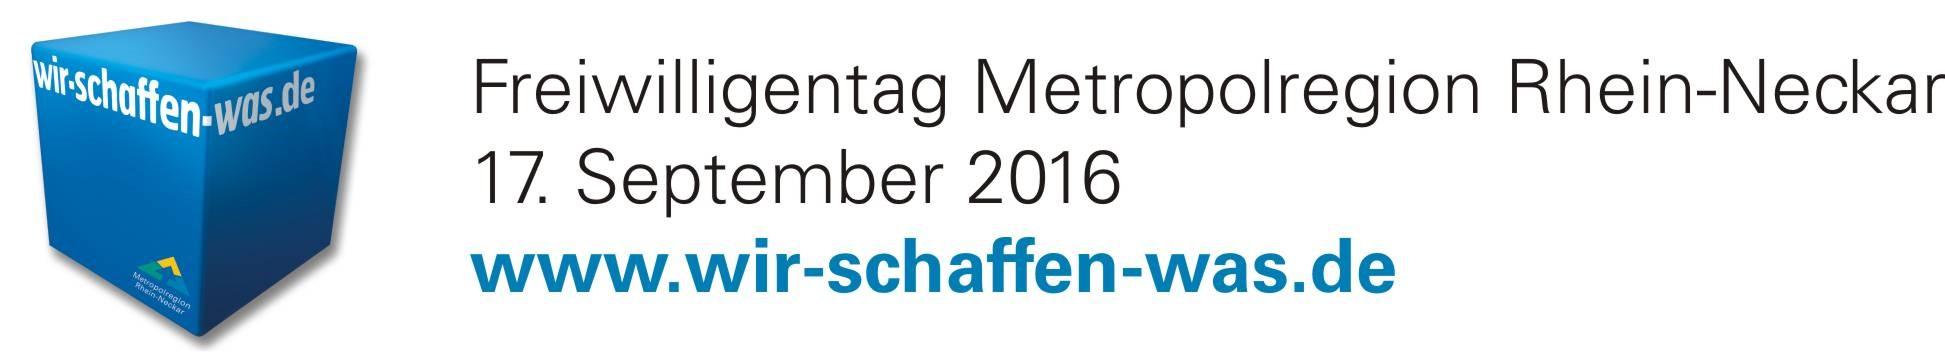 MRRN_Freiwilligentag2016